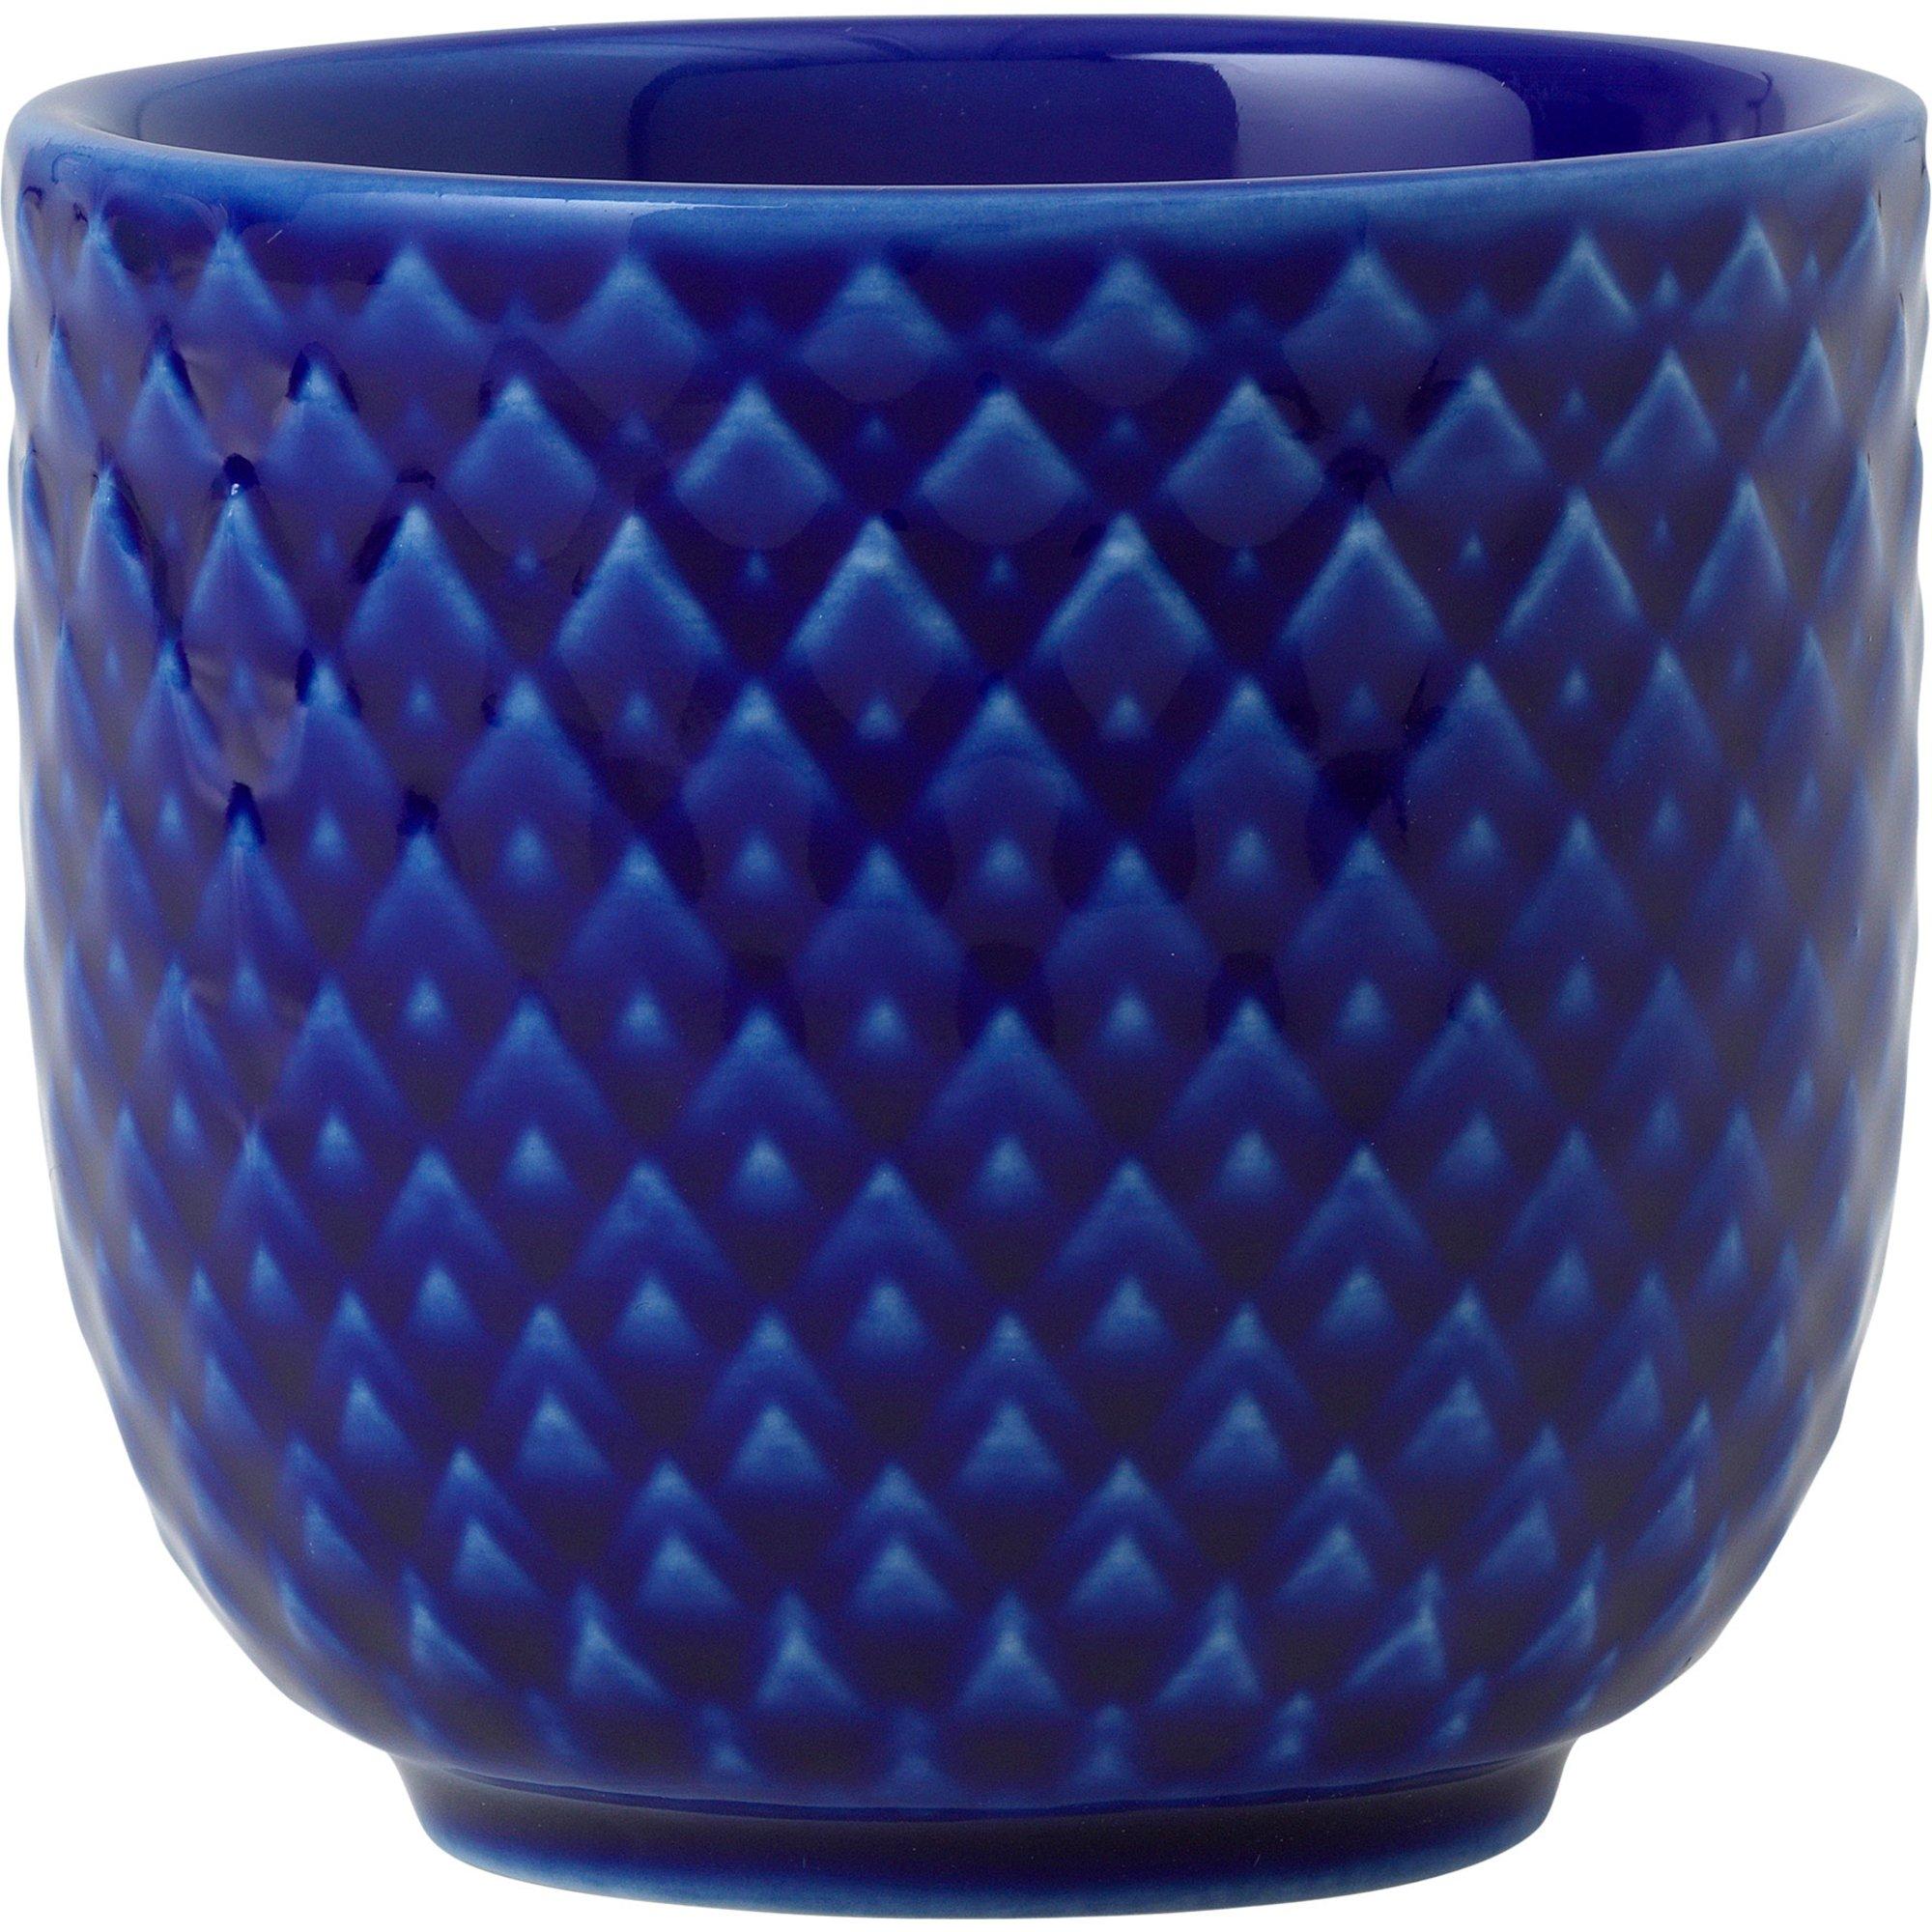 Lyngby Porcelæn Rhombe Color äggkopp 5 cm. Mörkblå